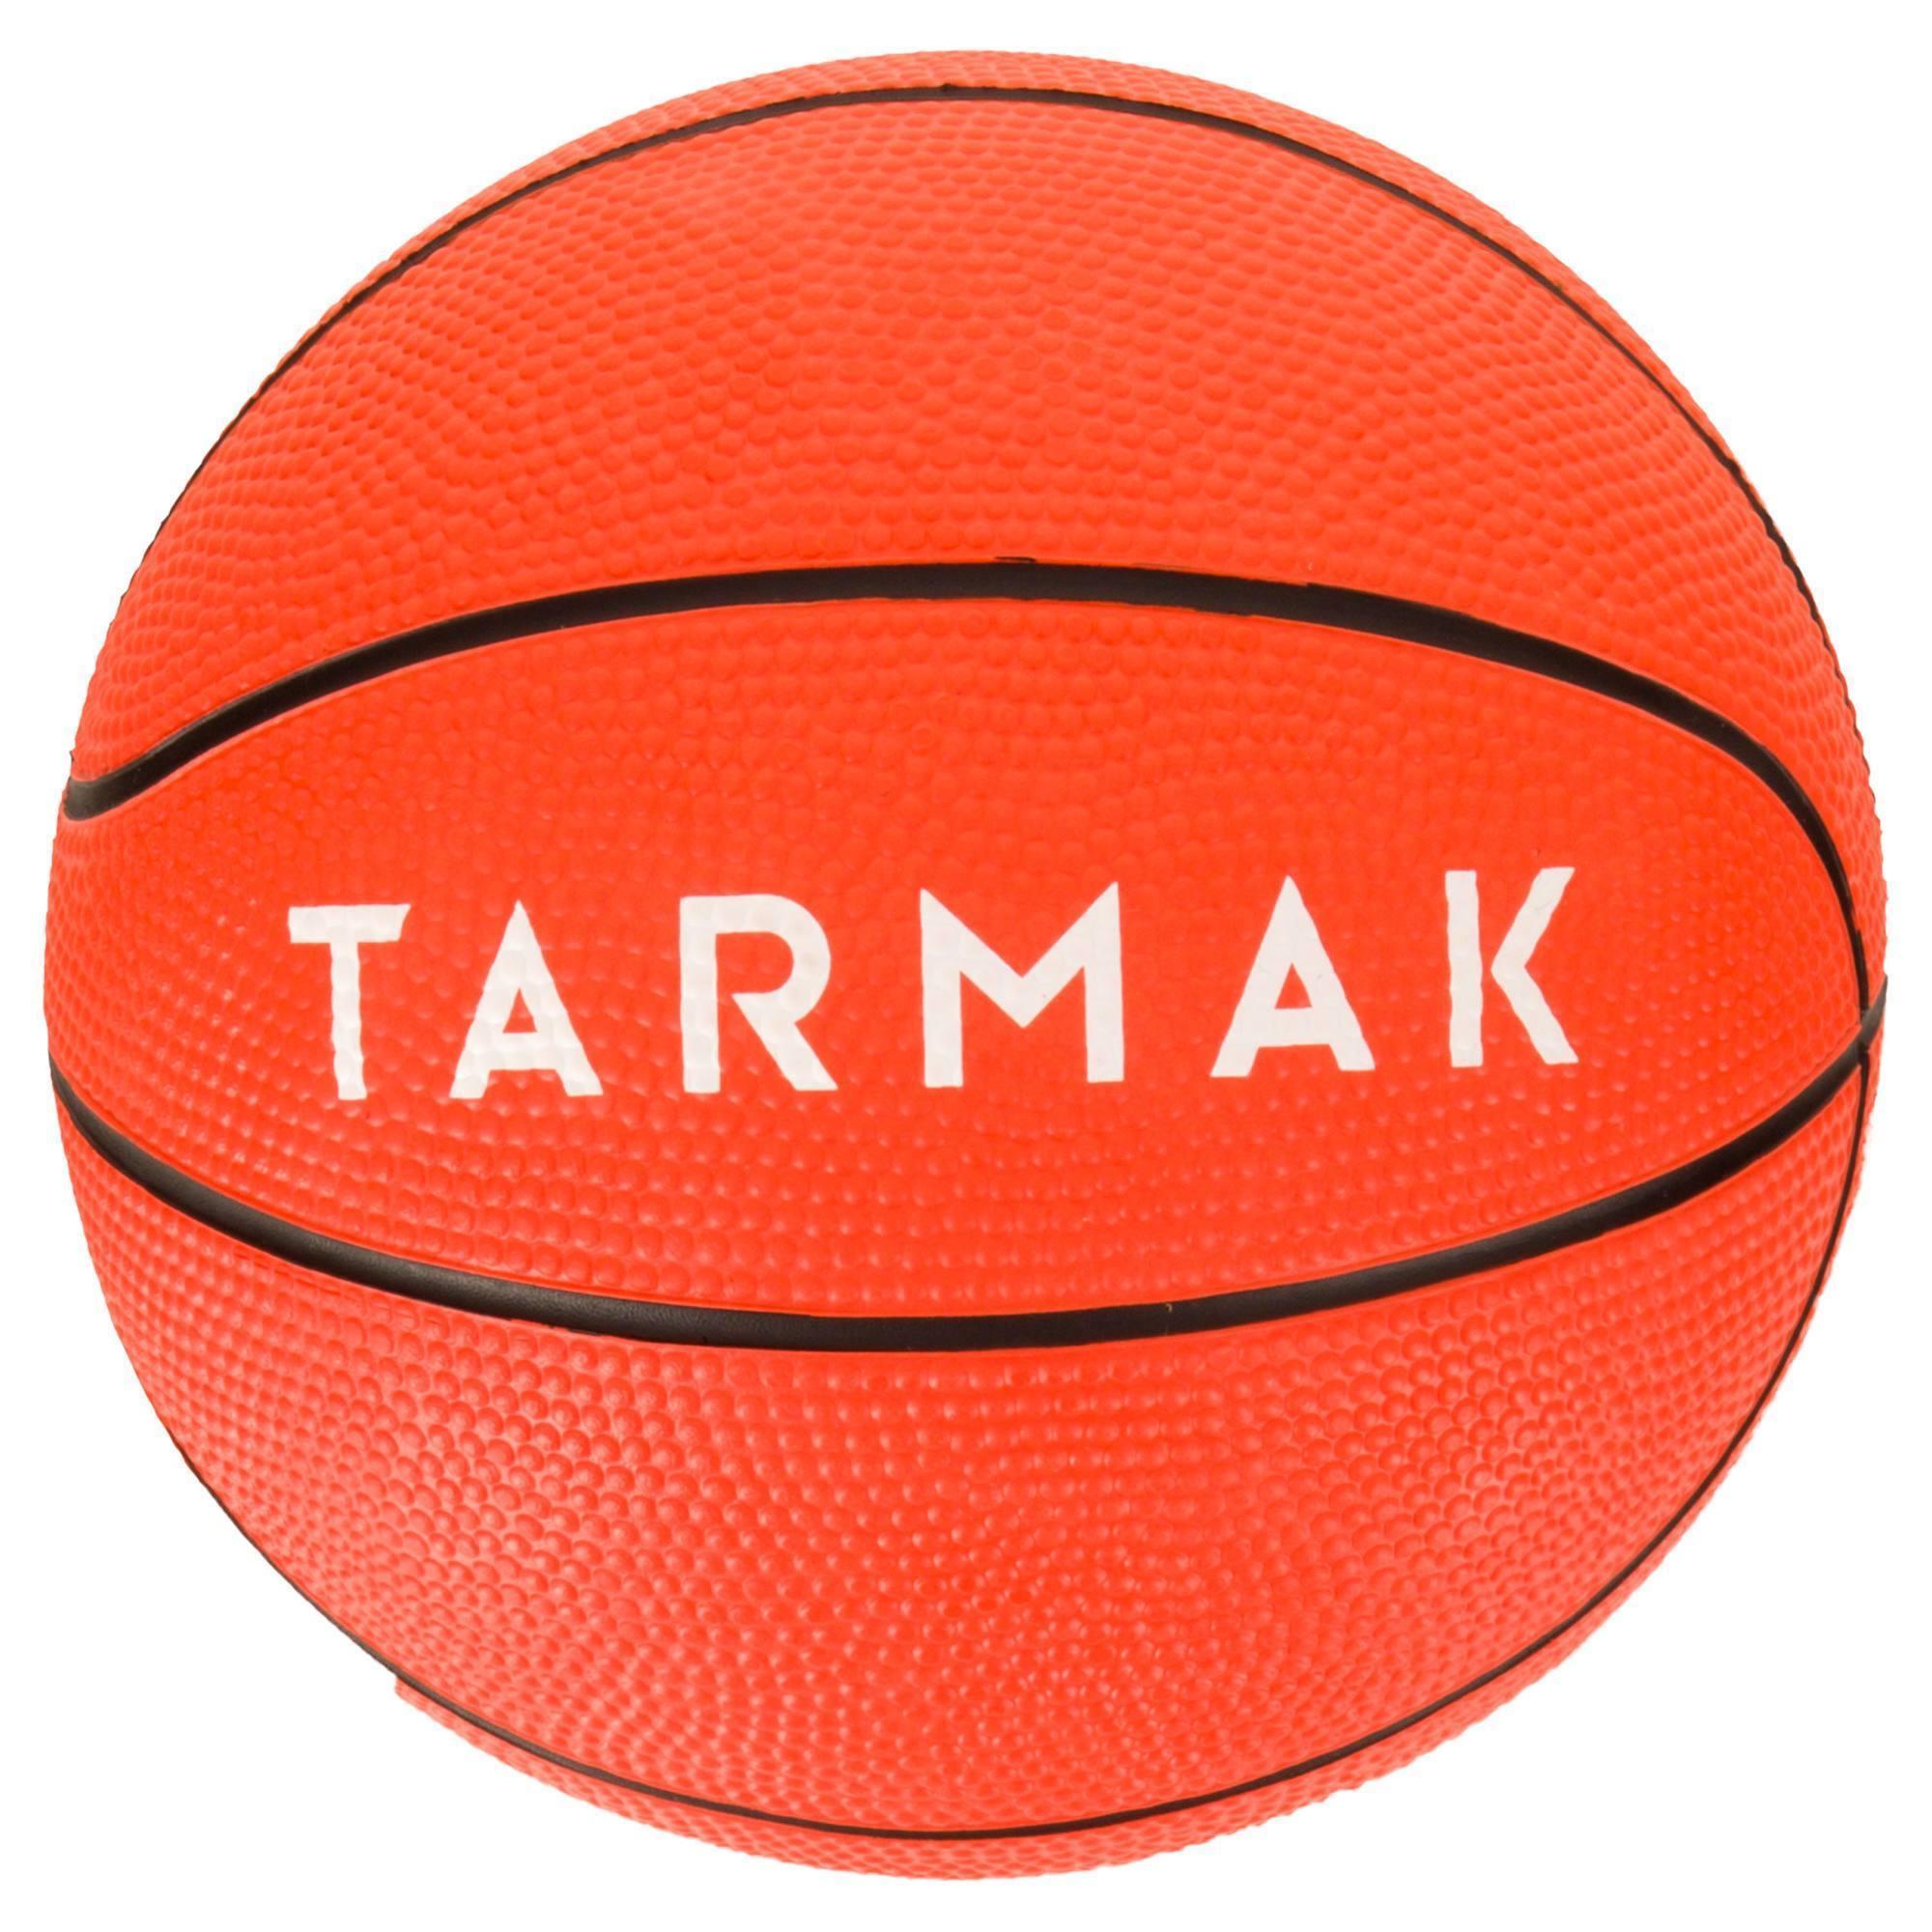 Mini ballon basket ball enfant int rieur clubs collectivit s decathlon pro - Ballon basket decathlon ...